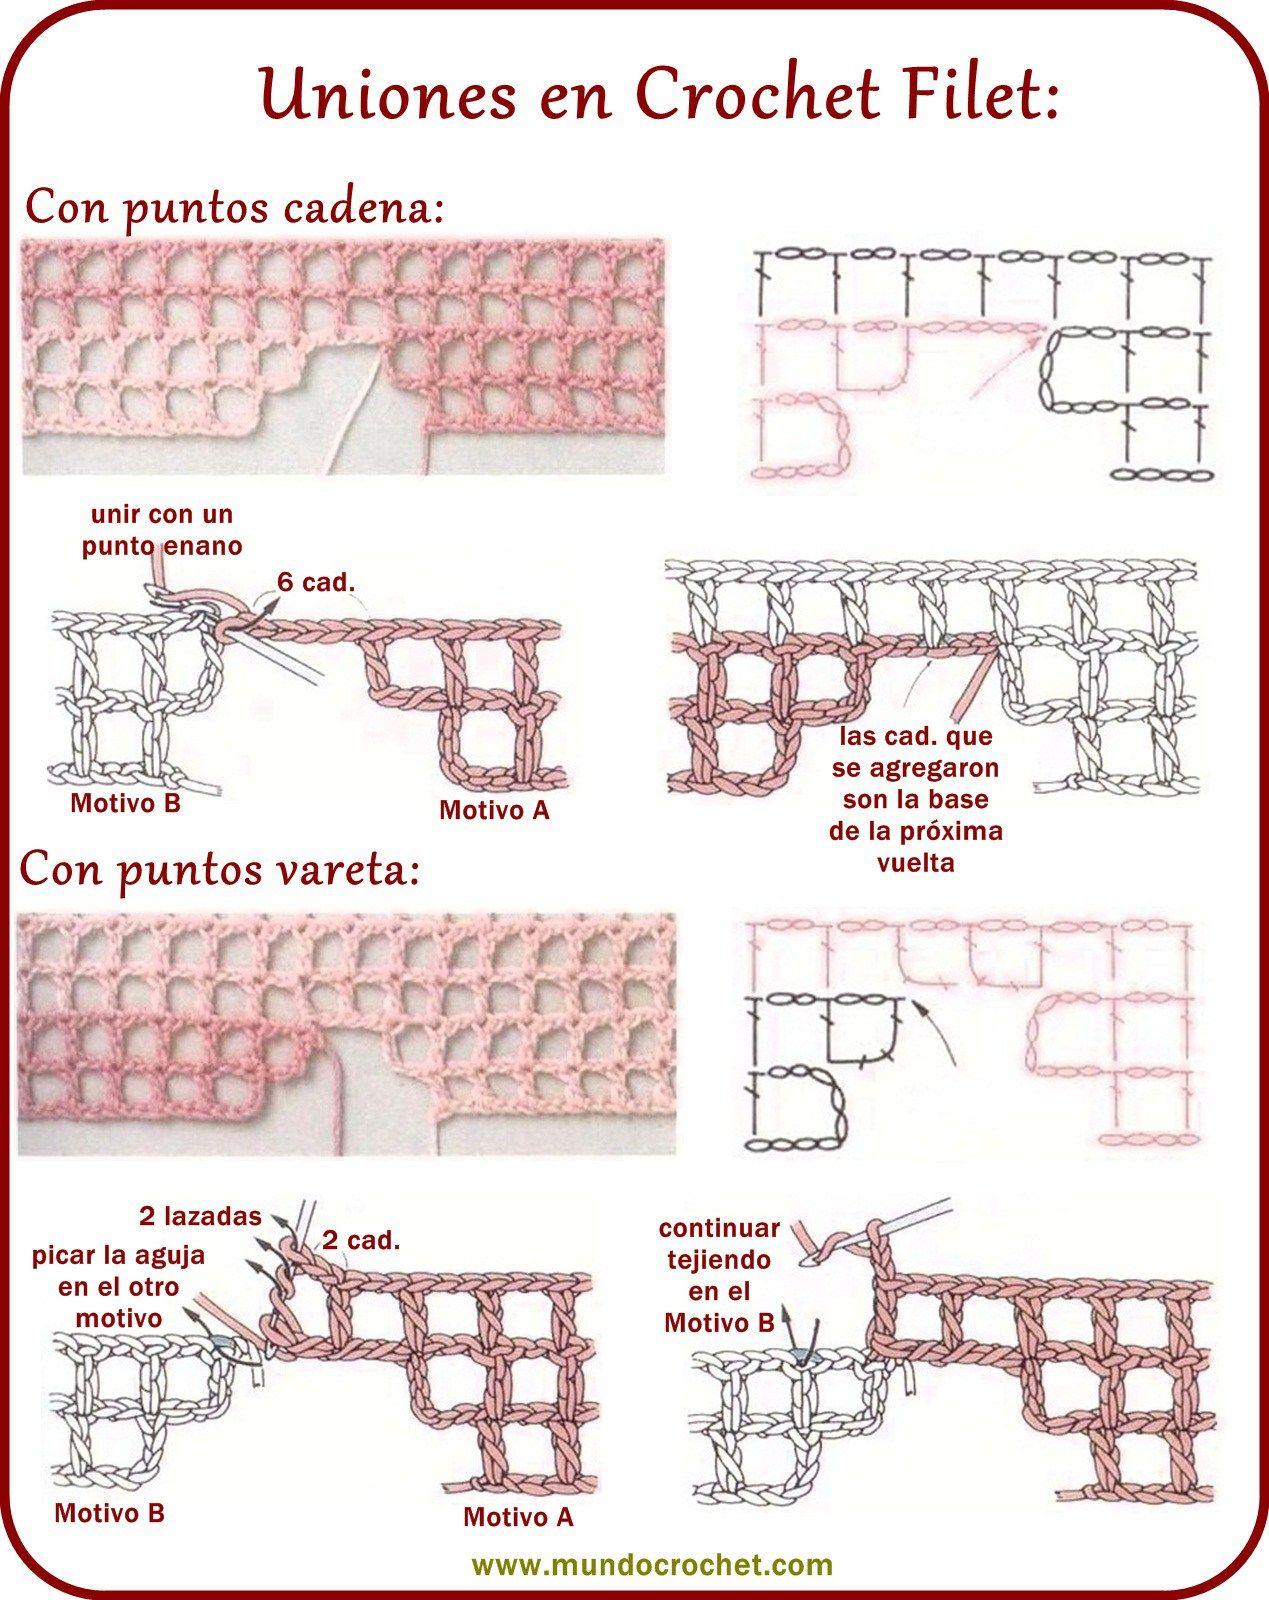 Crochet Filet | Técnicas de crochet | Pinterest | Filete, Cómo tejer ...